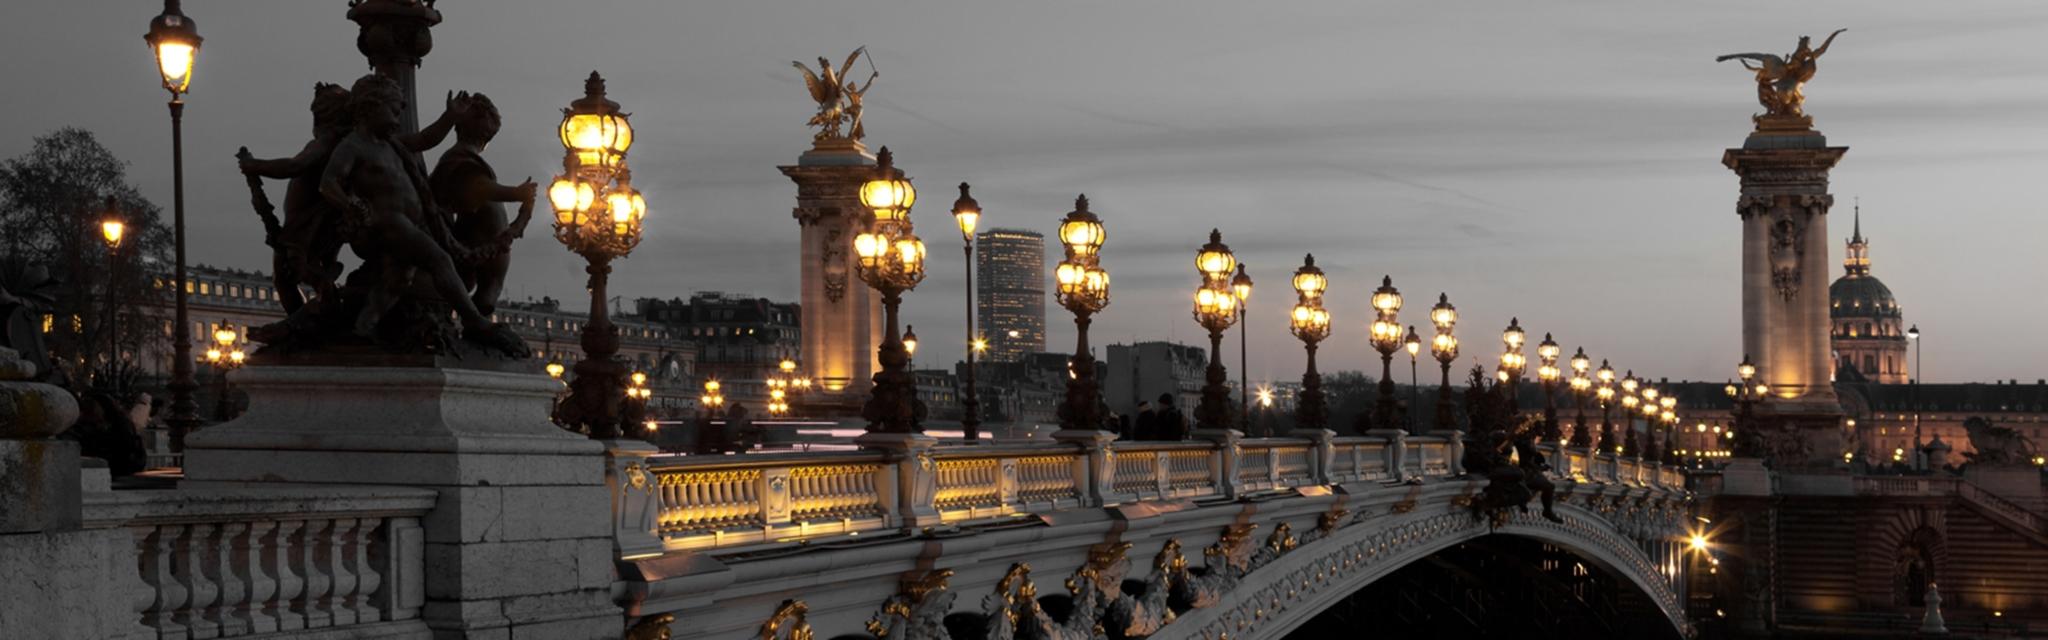 PONT PARIS 2